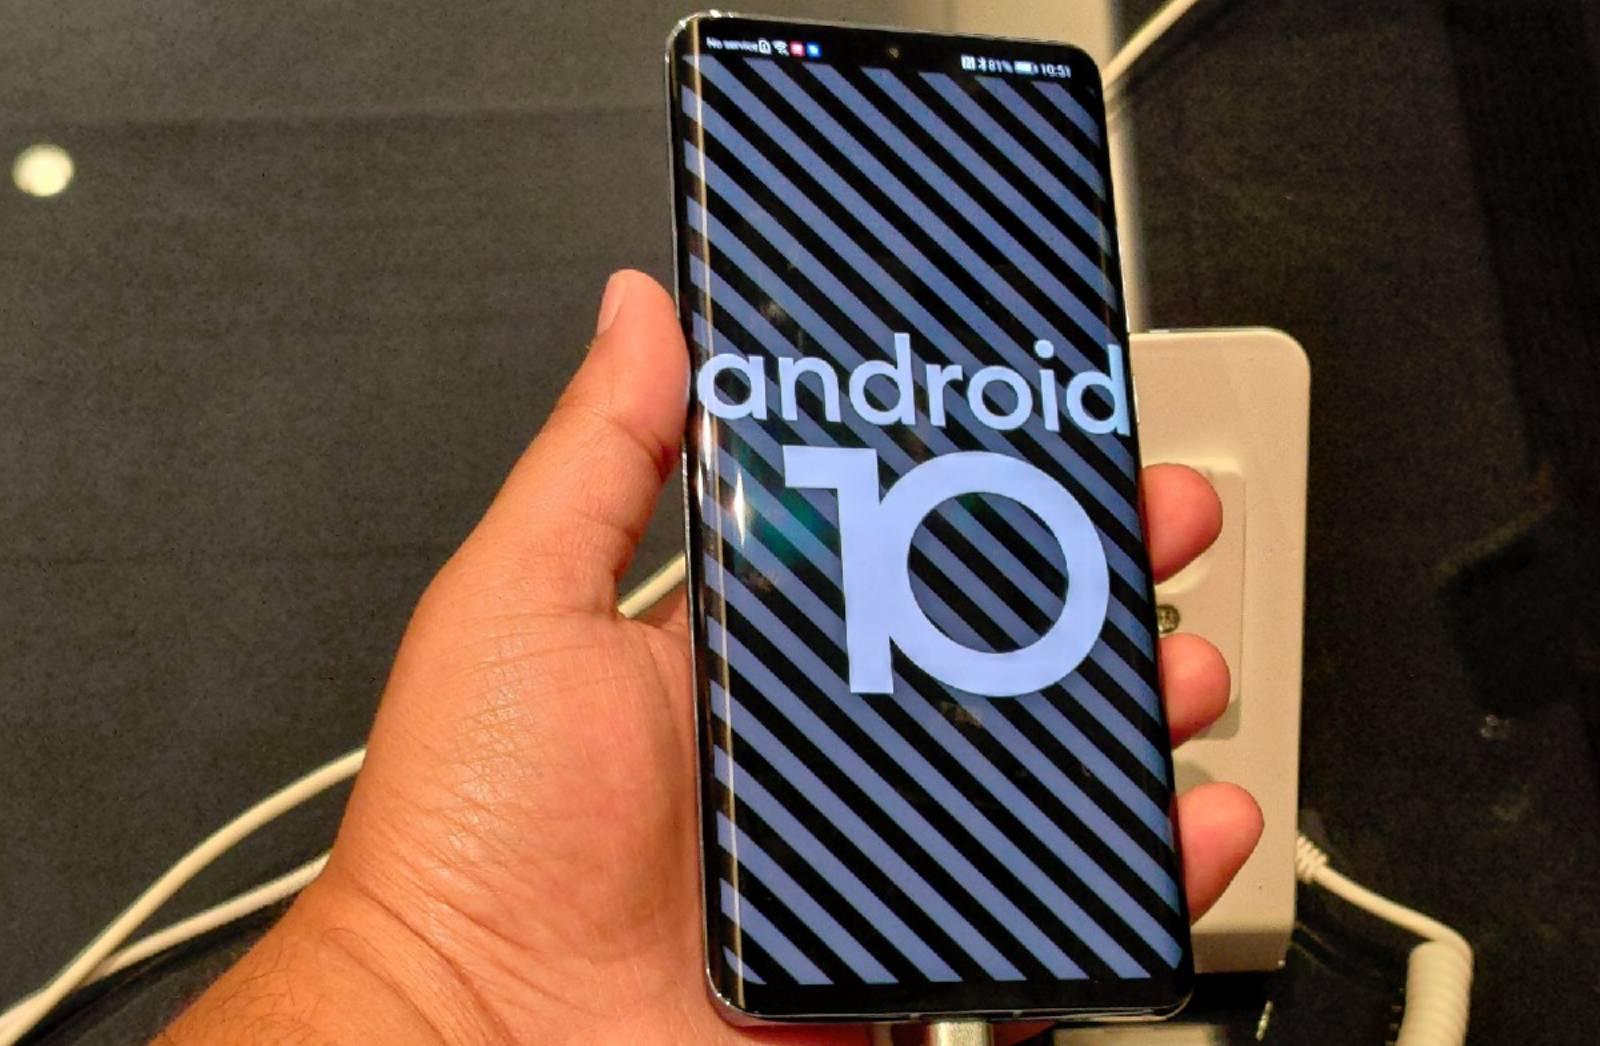 Android 10. Functia GROZAVA luata din iPhone XS si Imbunatatita